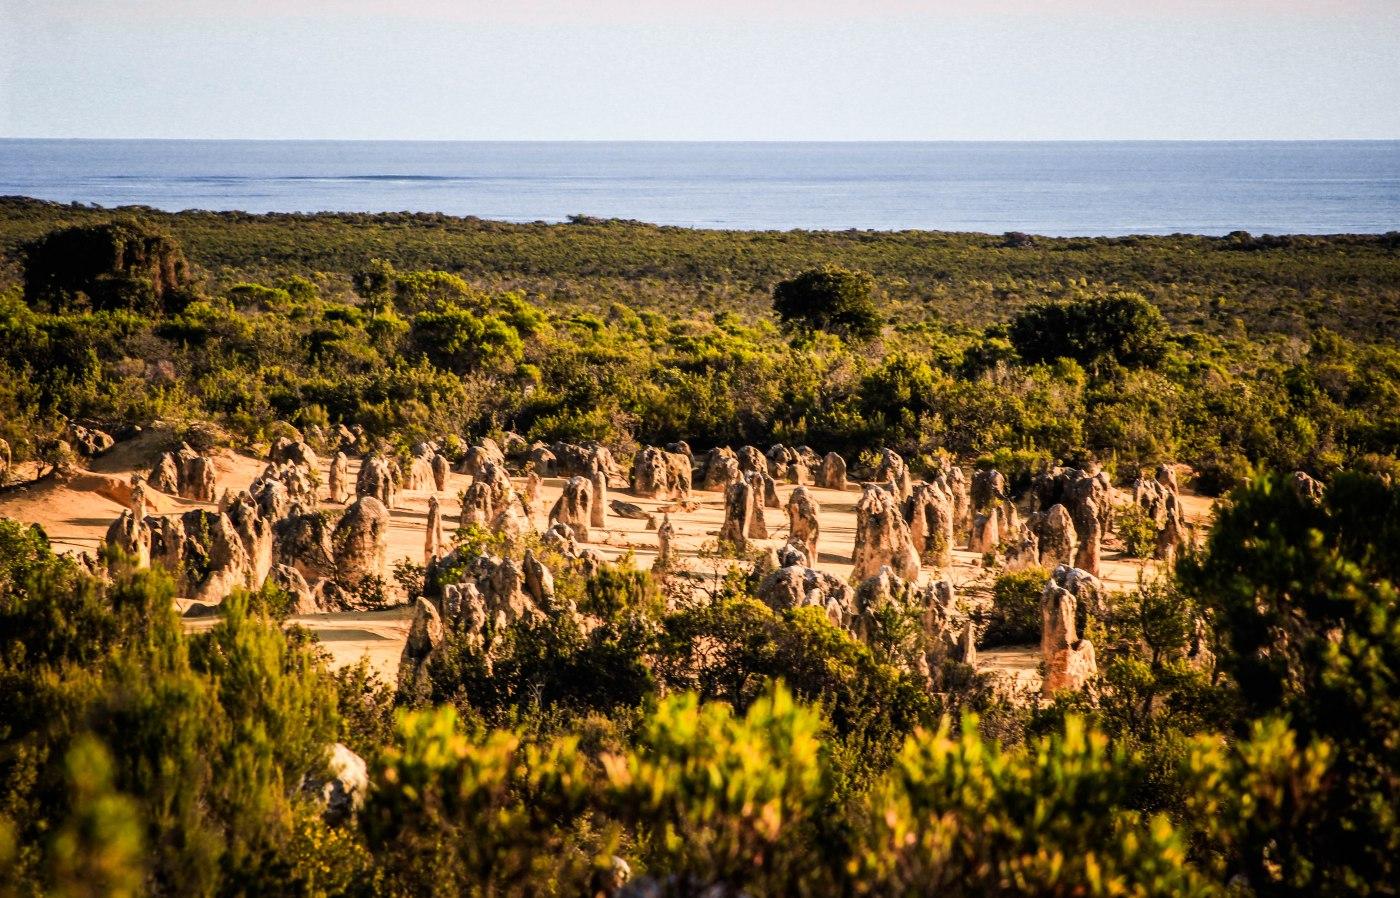 A Western Australia Road Trip Geraldton and the Pinnacles Desert